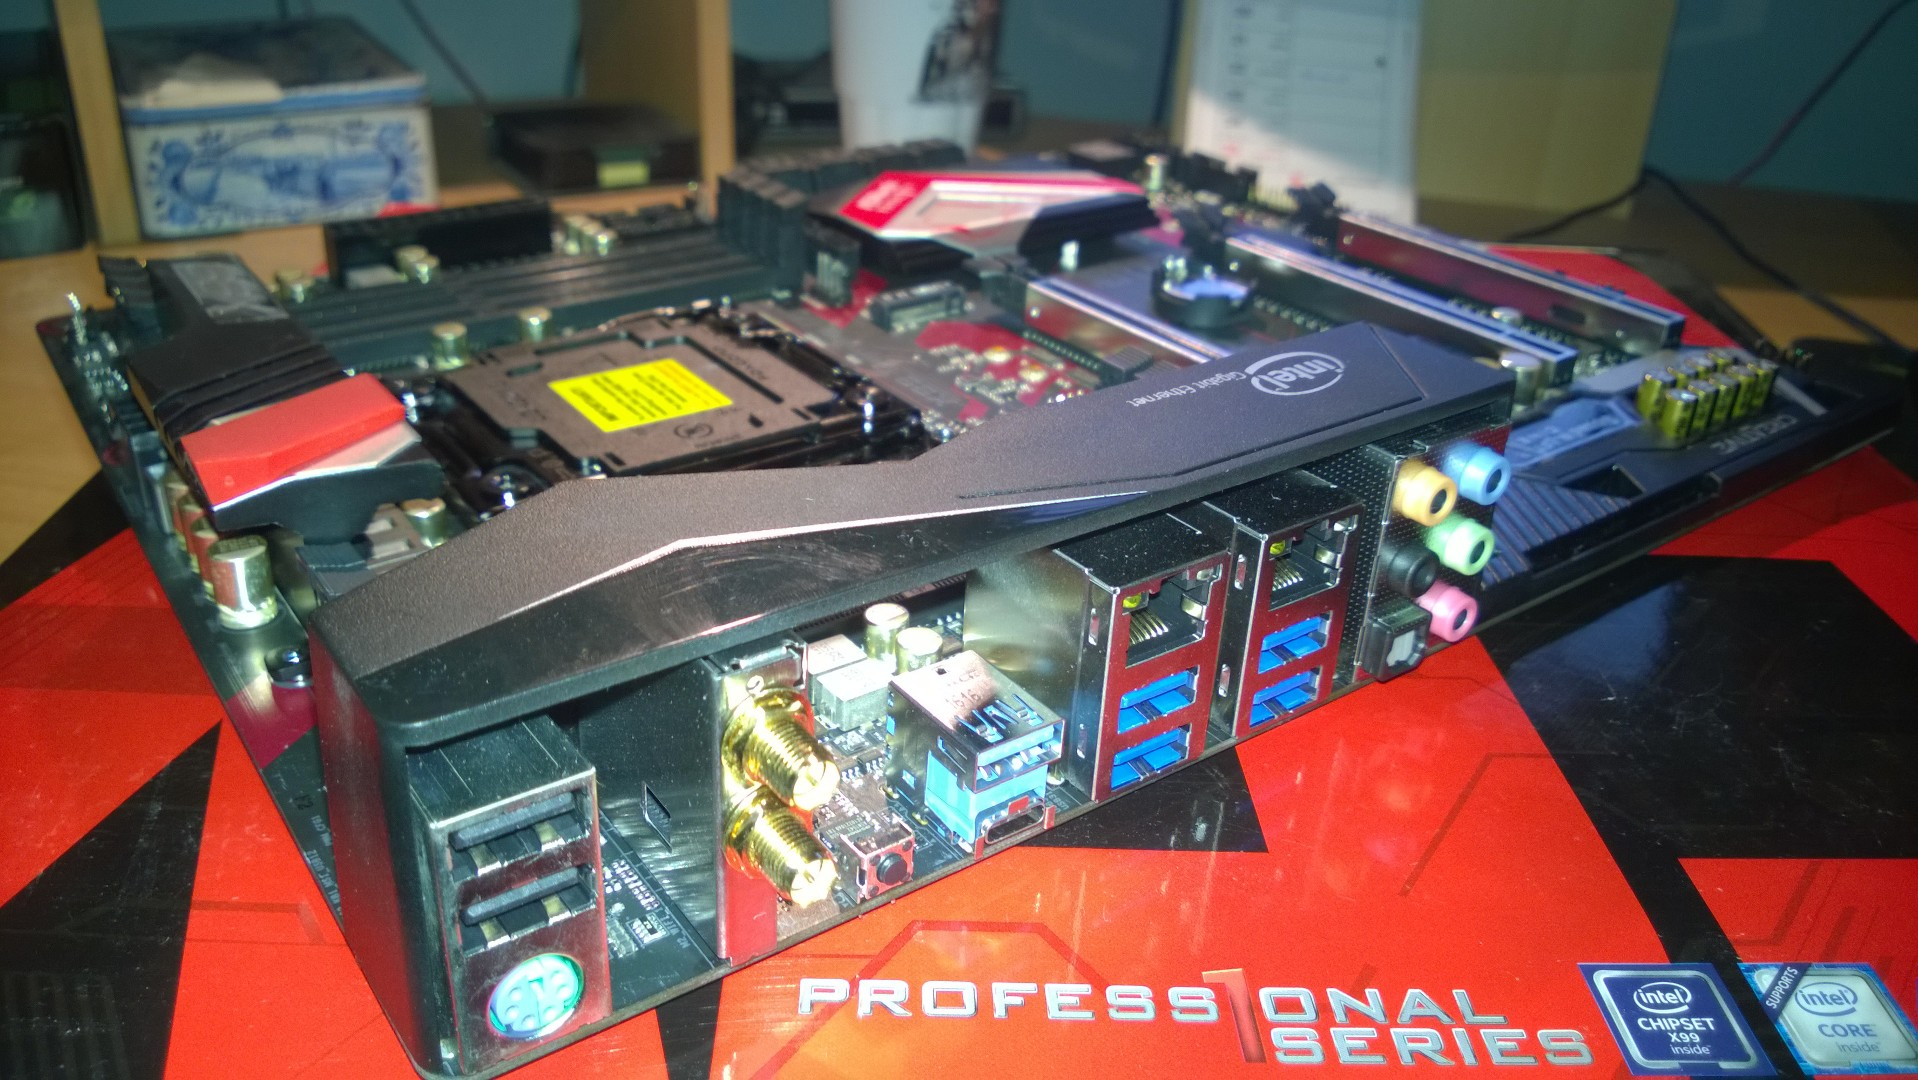 WP_20161219_0ASRock Fatal1ty X99 Professional Gaming i7 39